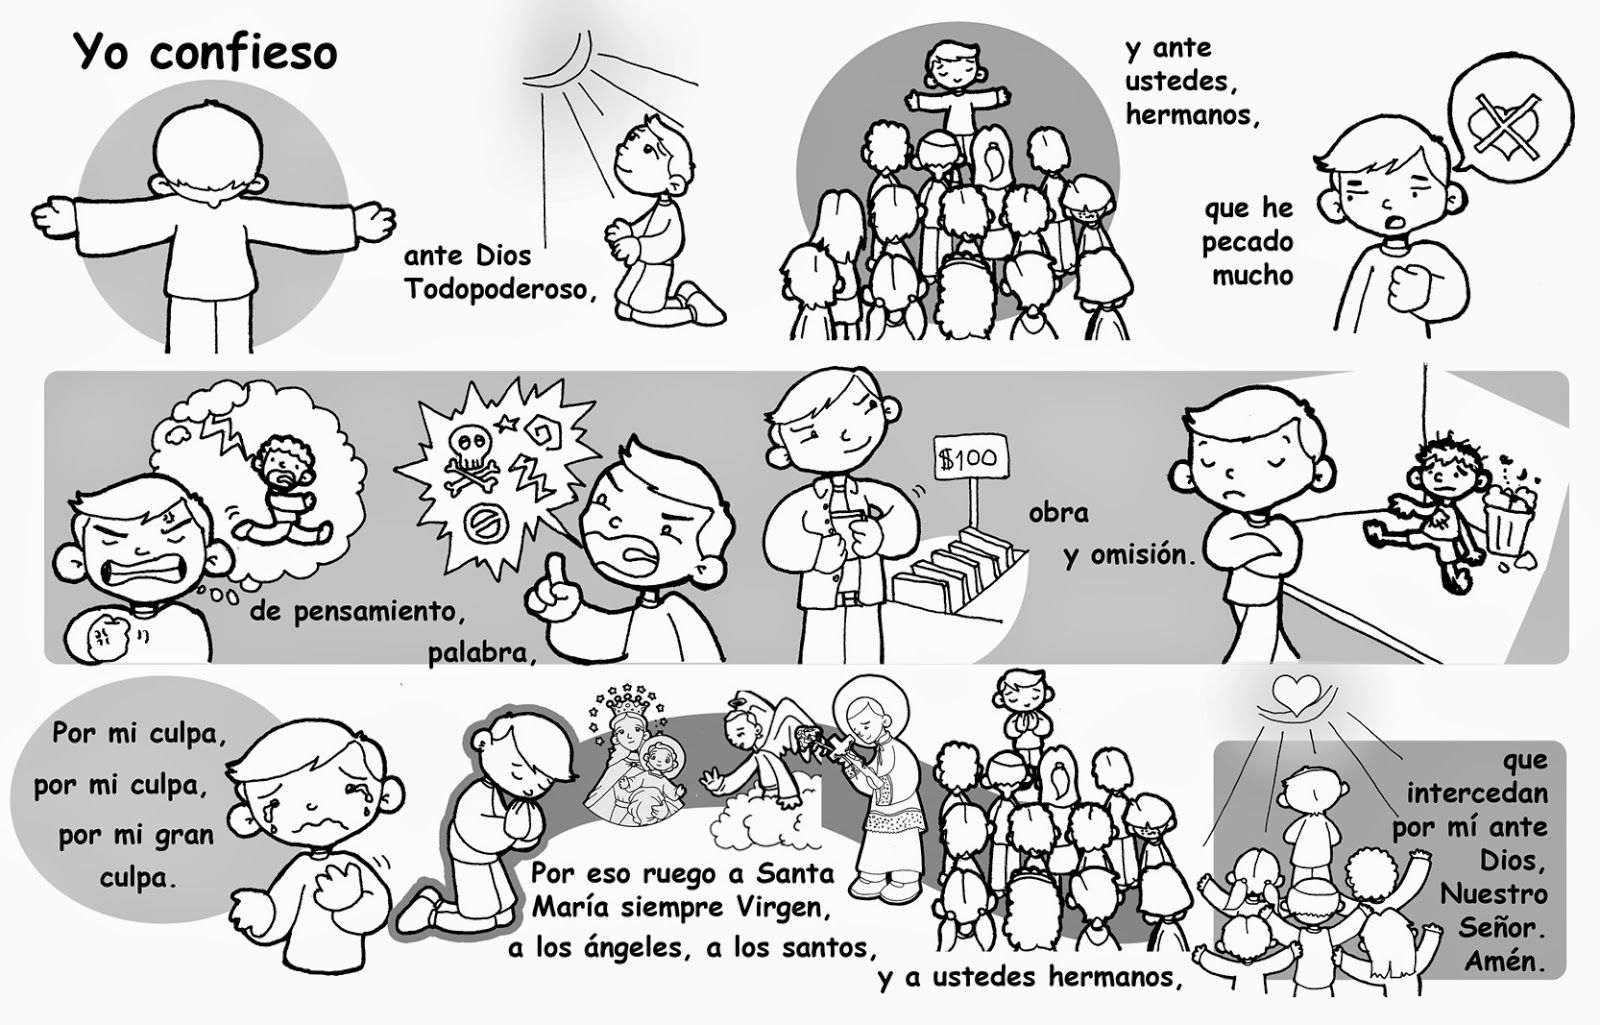 Rito Del Matrimonio Catolico Fuera De La Misa : Dibujos para catequesis fichas religión pinterest